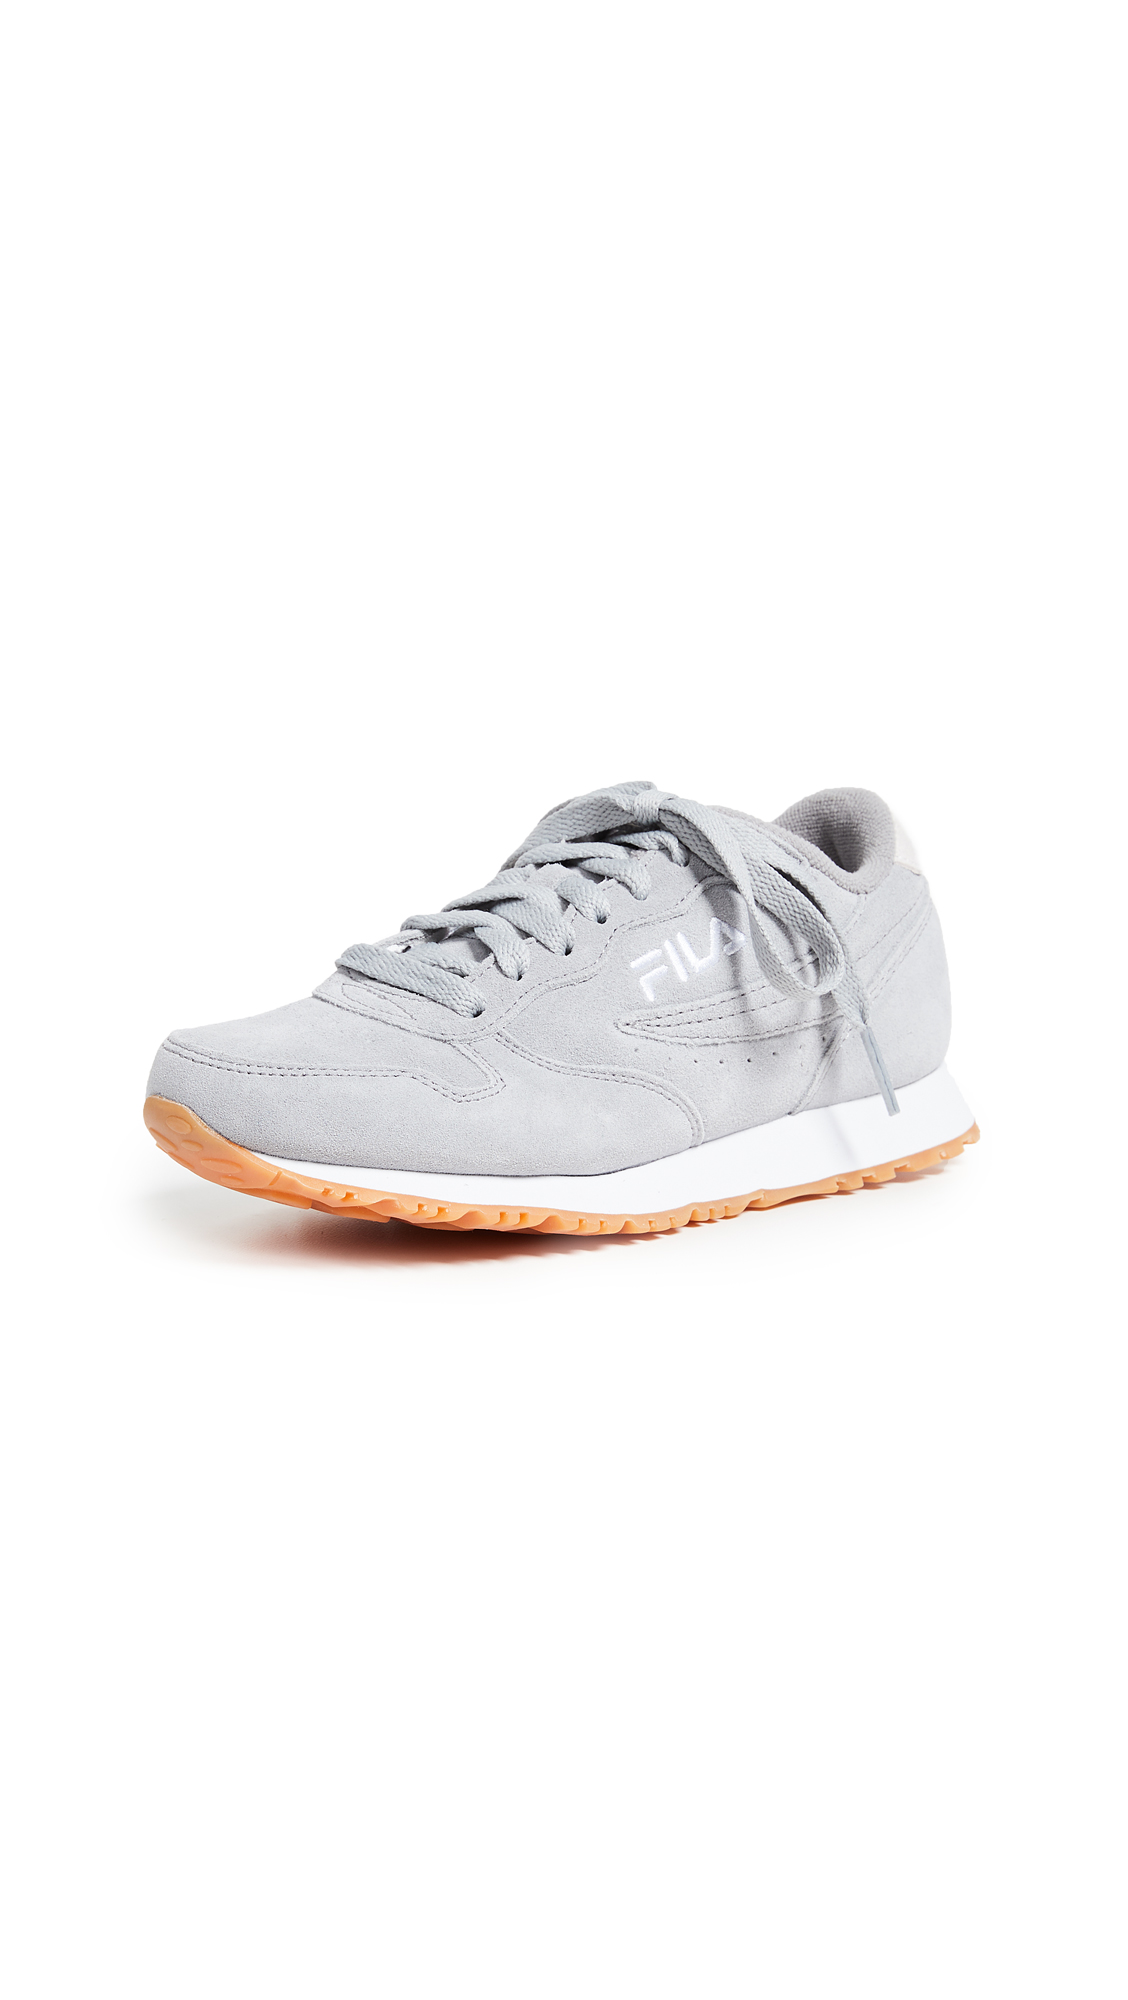 Photo of Fila Euro Joggers II online shoes sales